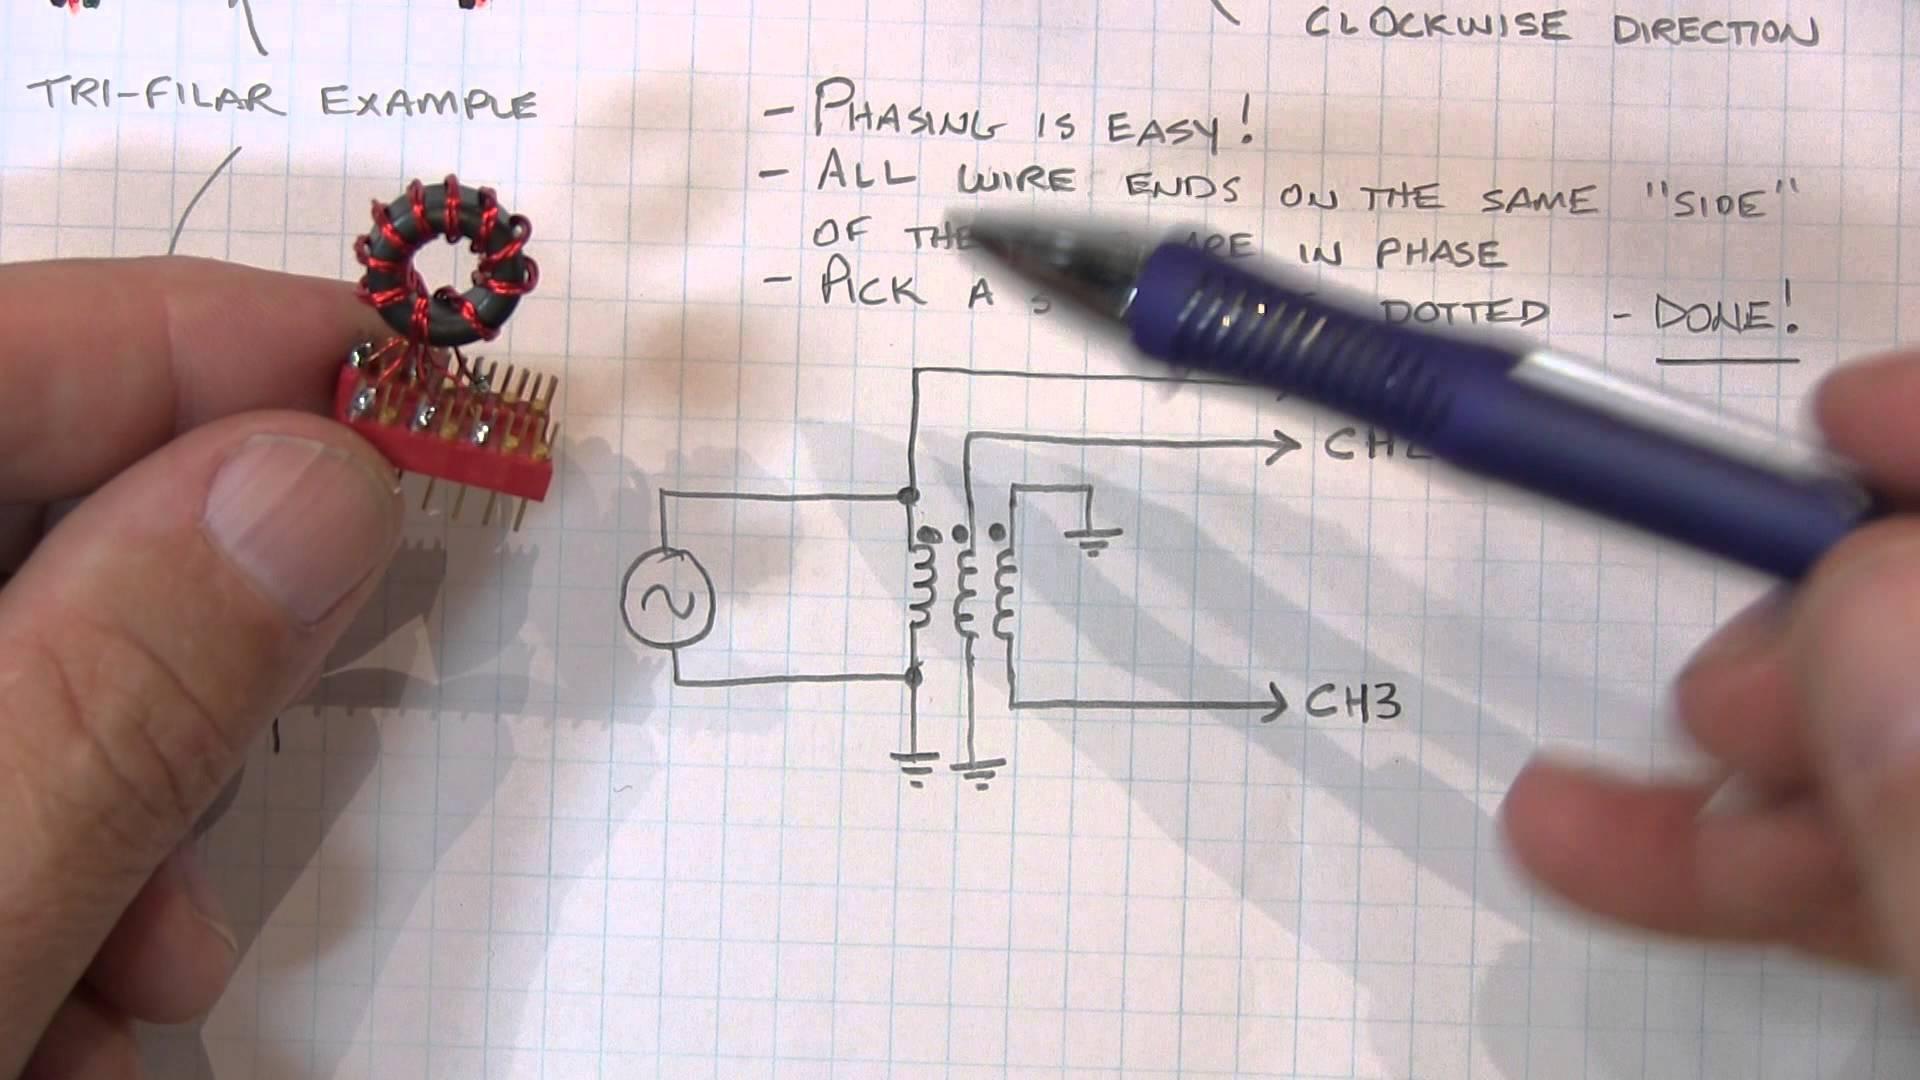 Basics of Phase Dots on Transformer Windings